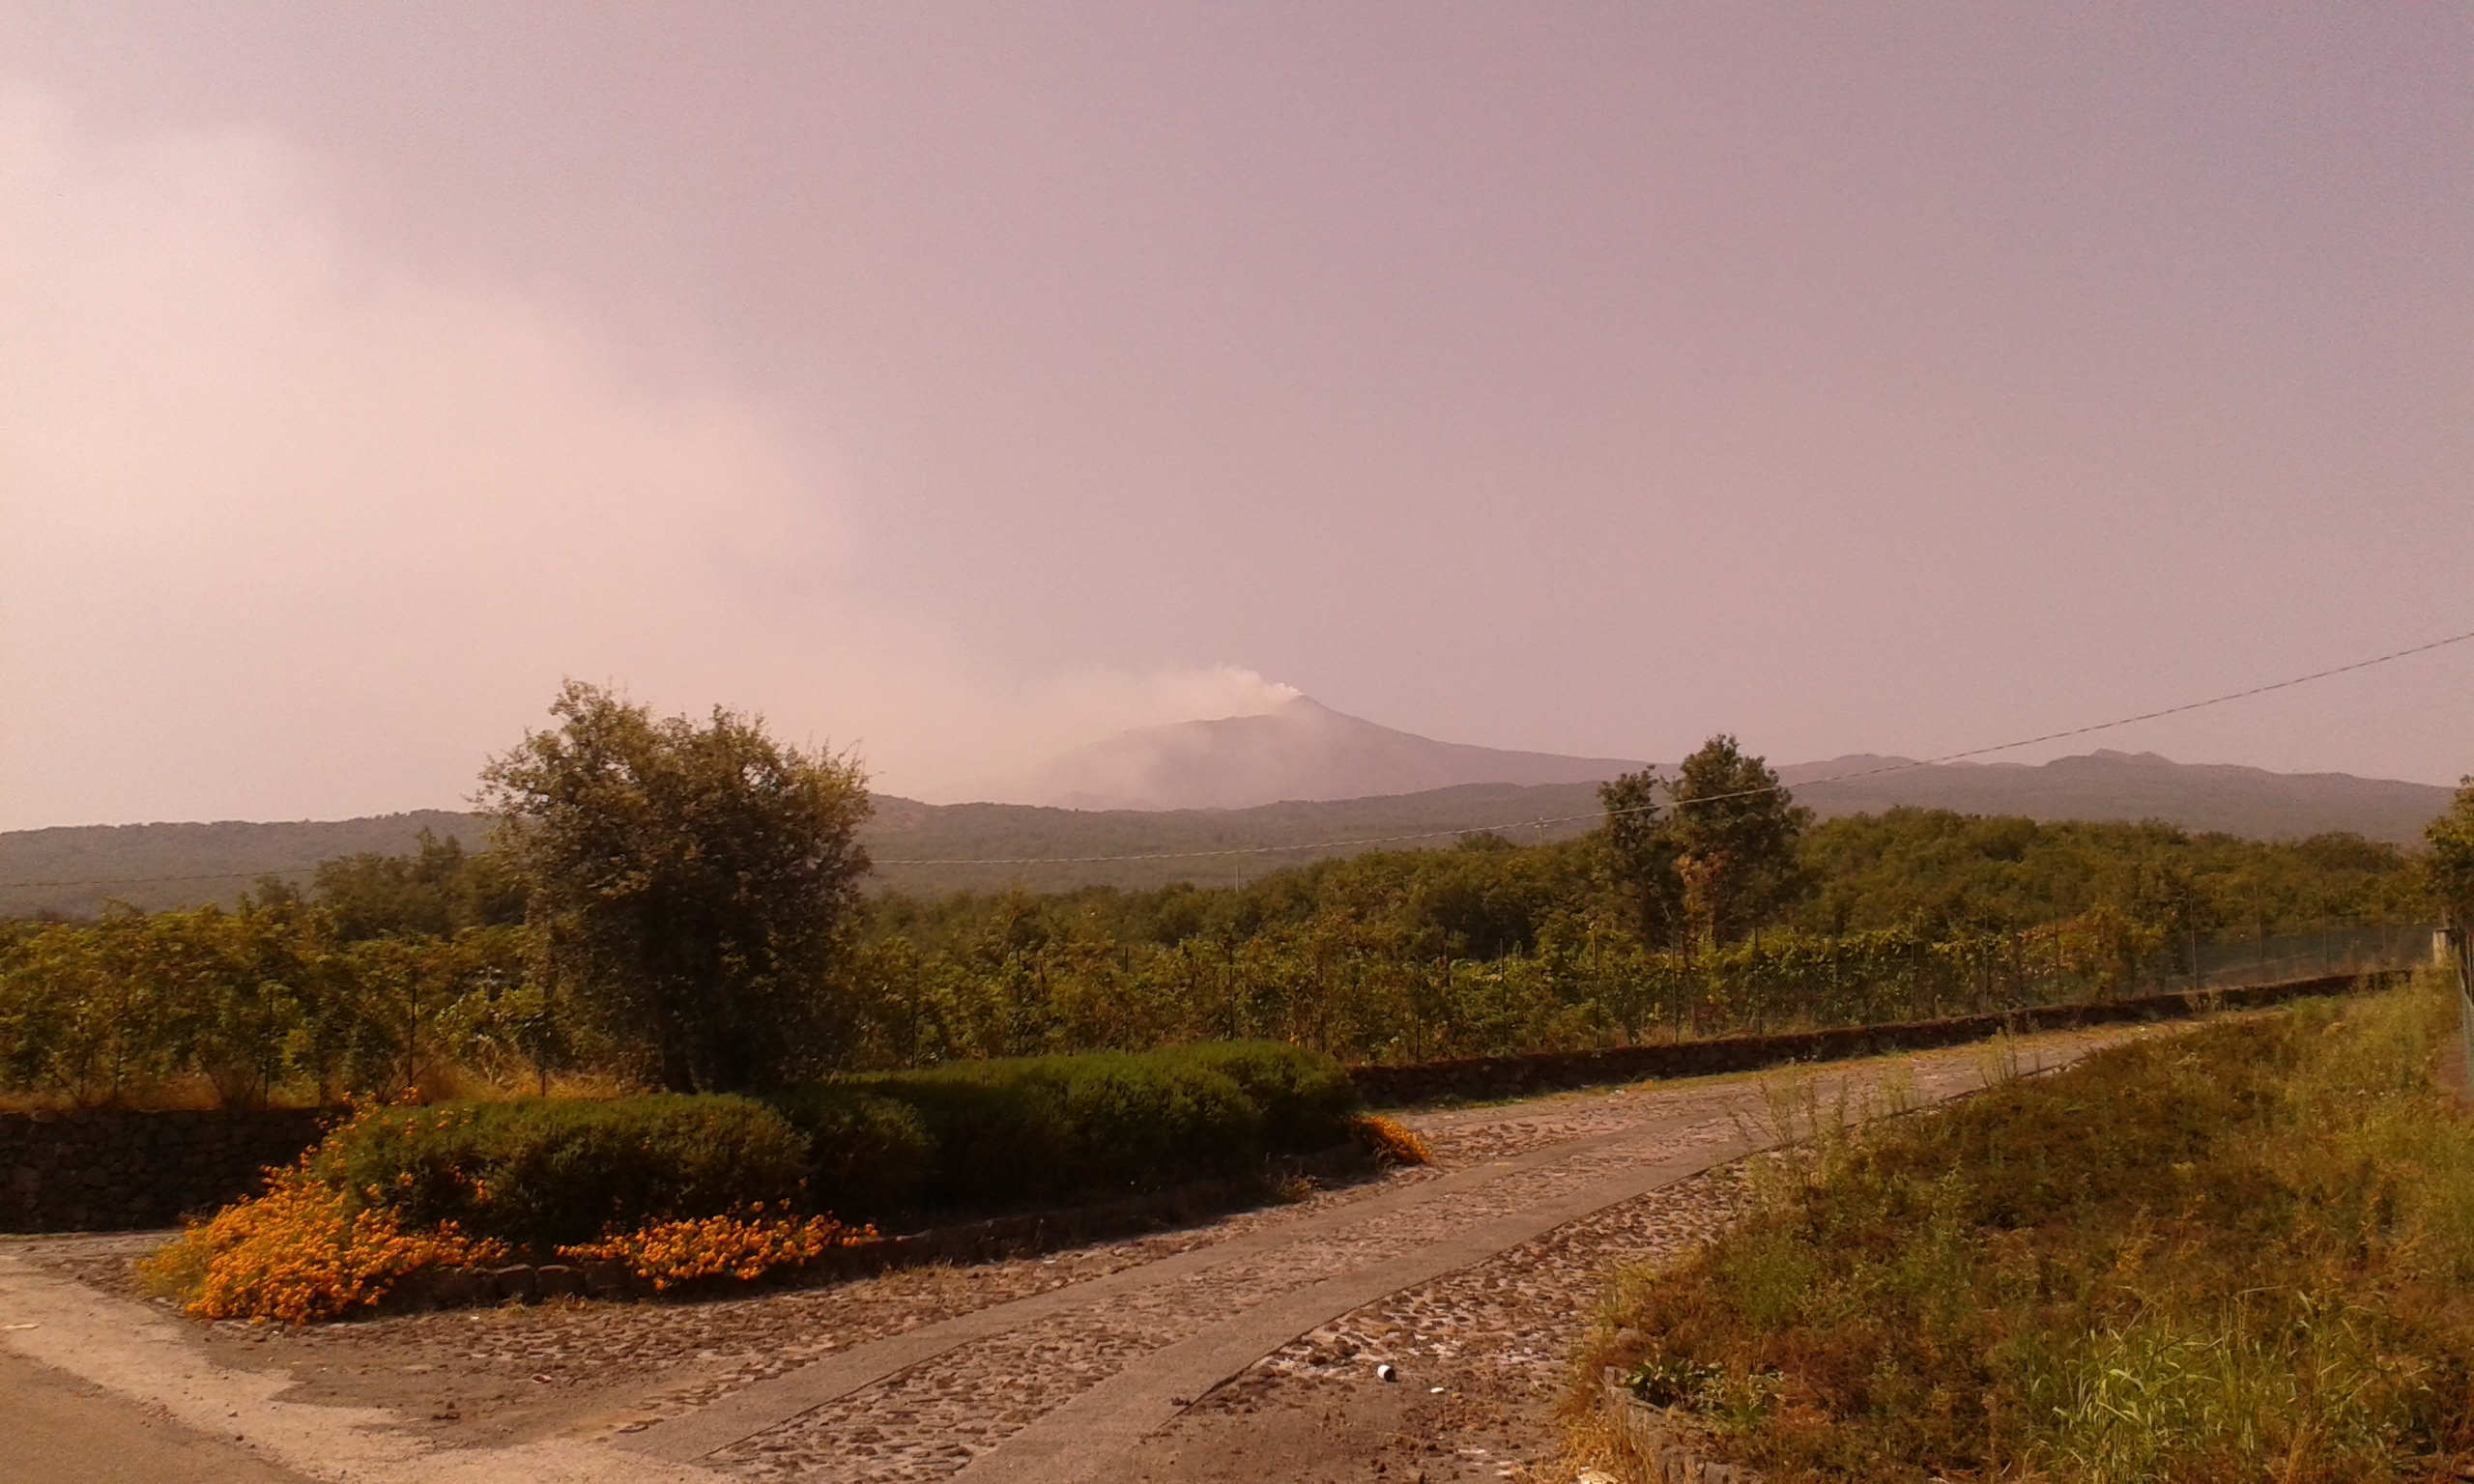 Etna, fumo